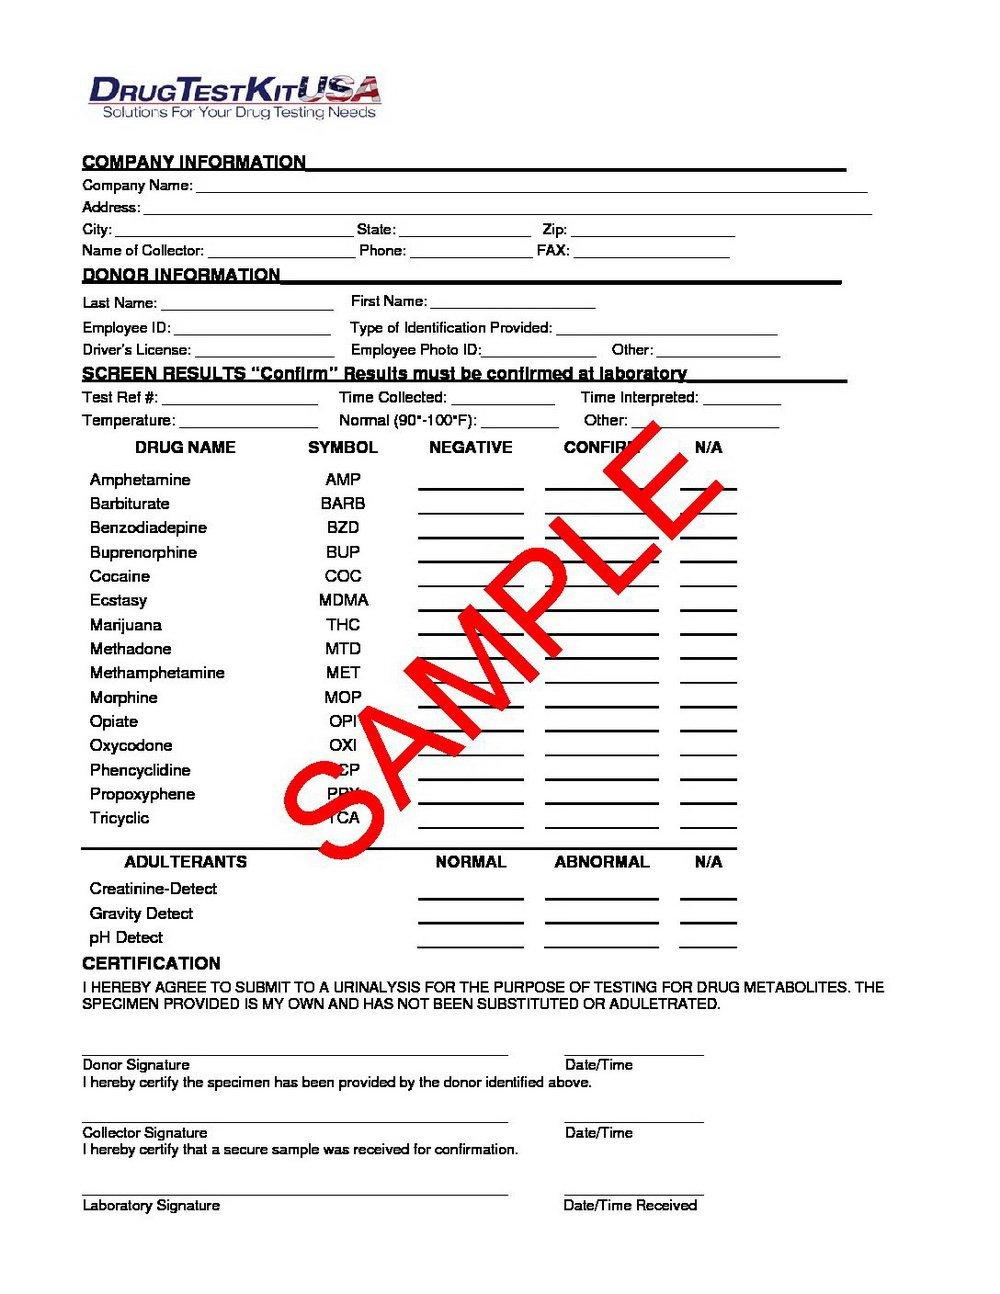 Blank Std Test Results form Negative Std Test Results form 2015 forms 7013